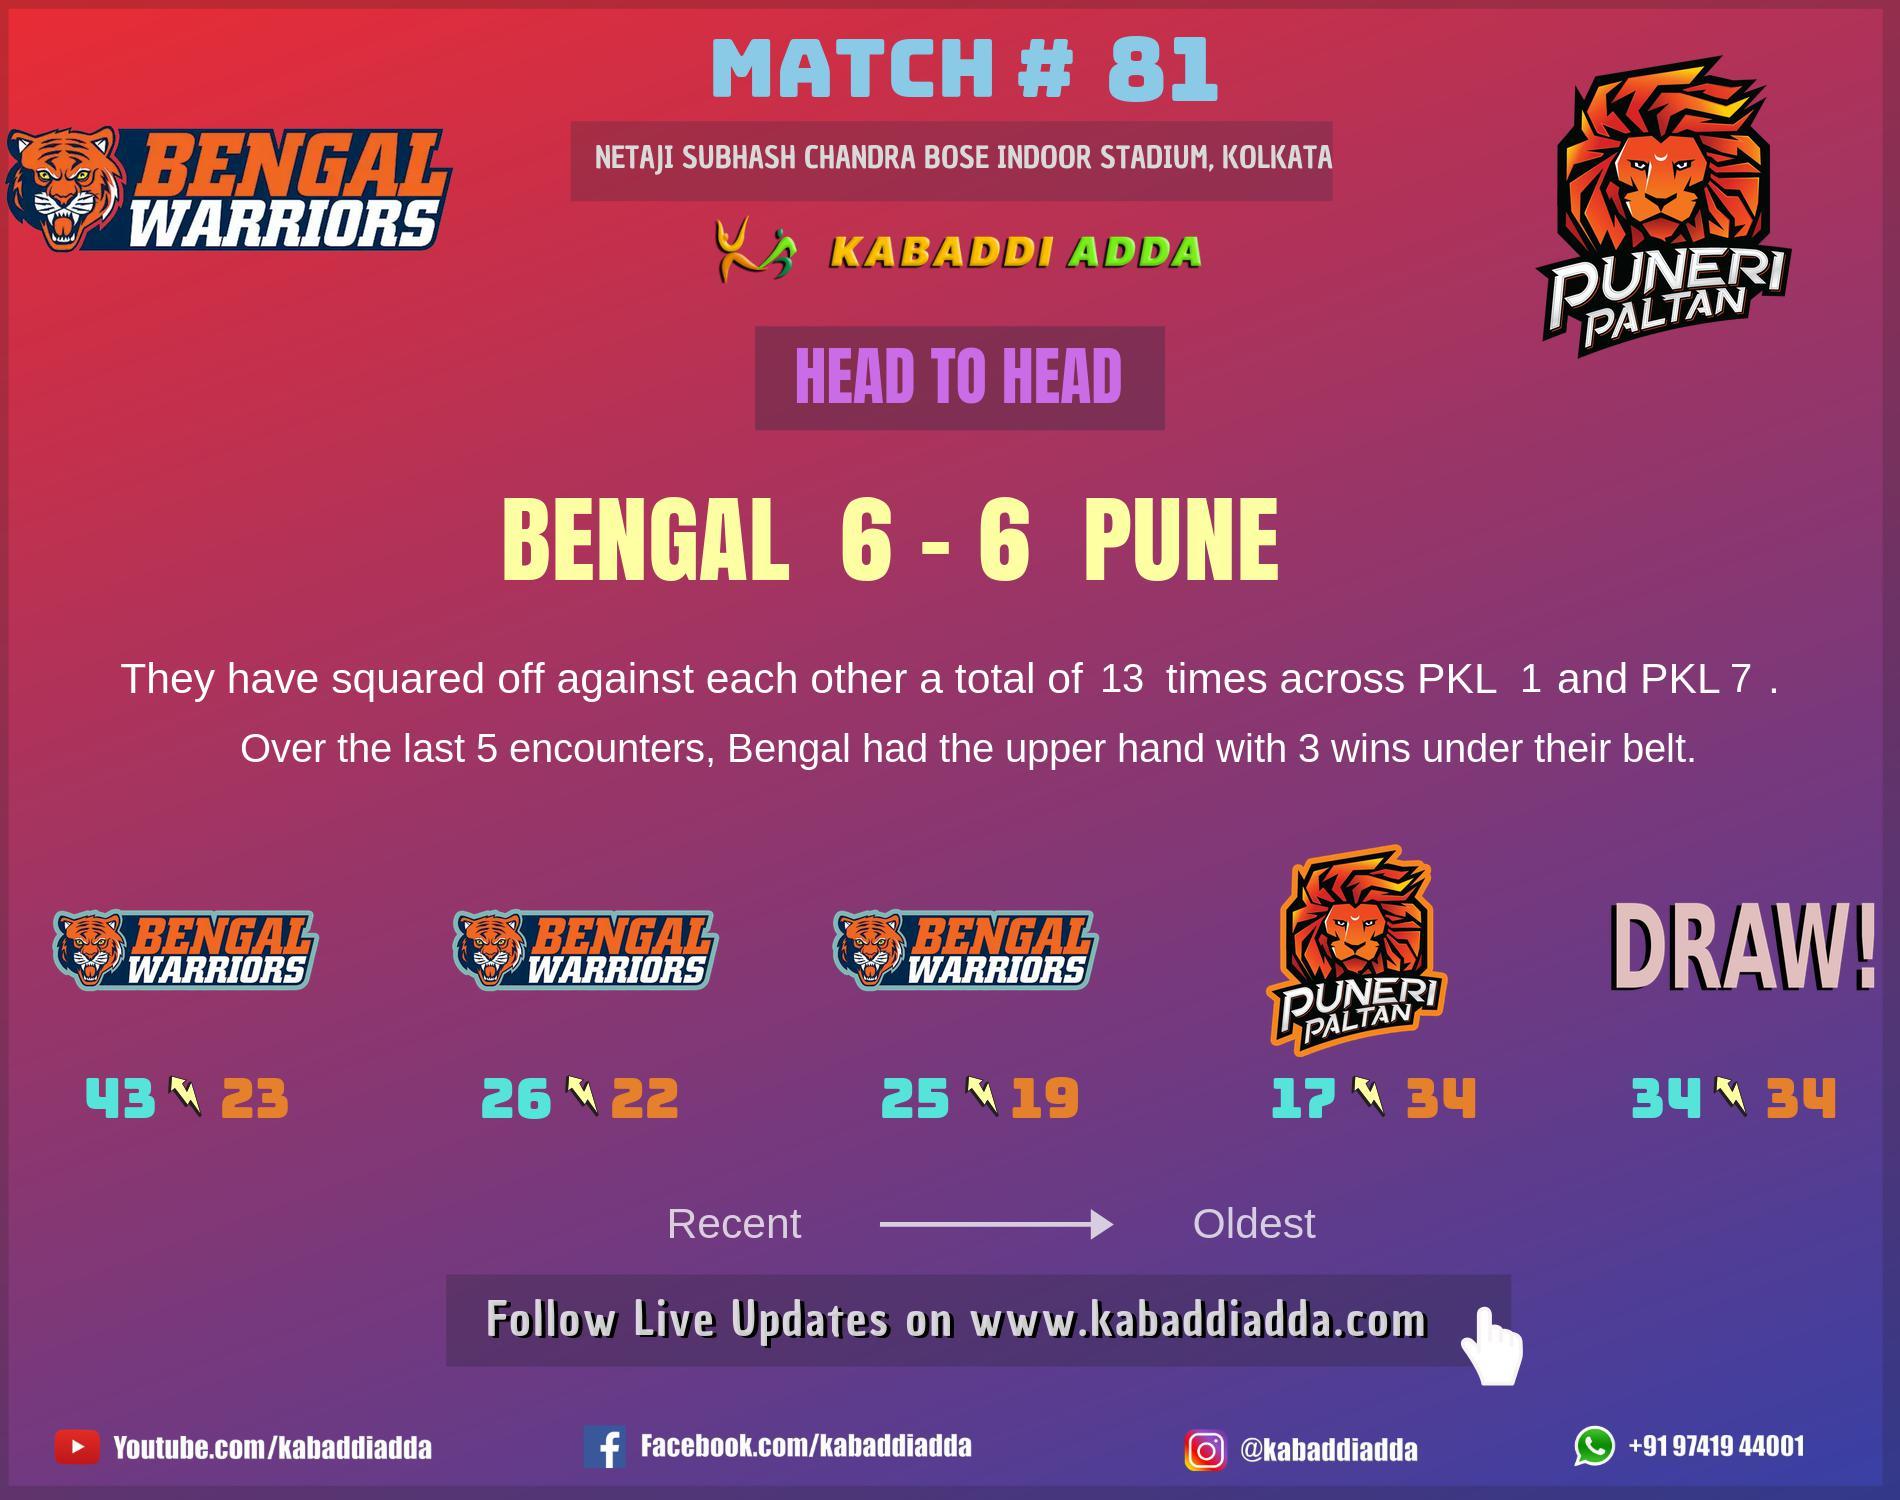 Bengal Warriors is playing against Puneri Paltan